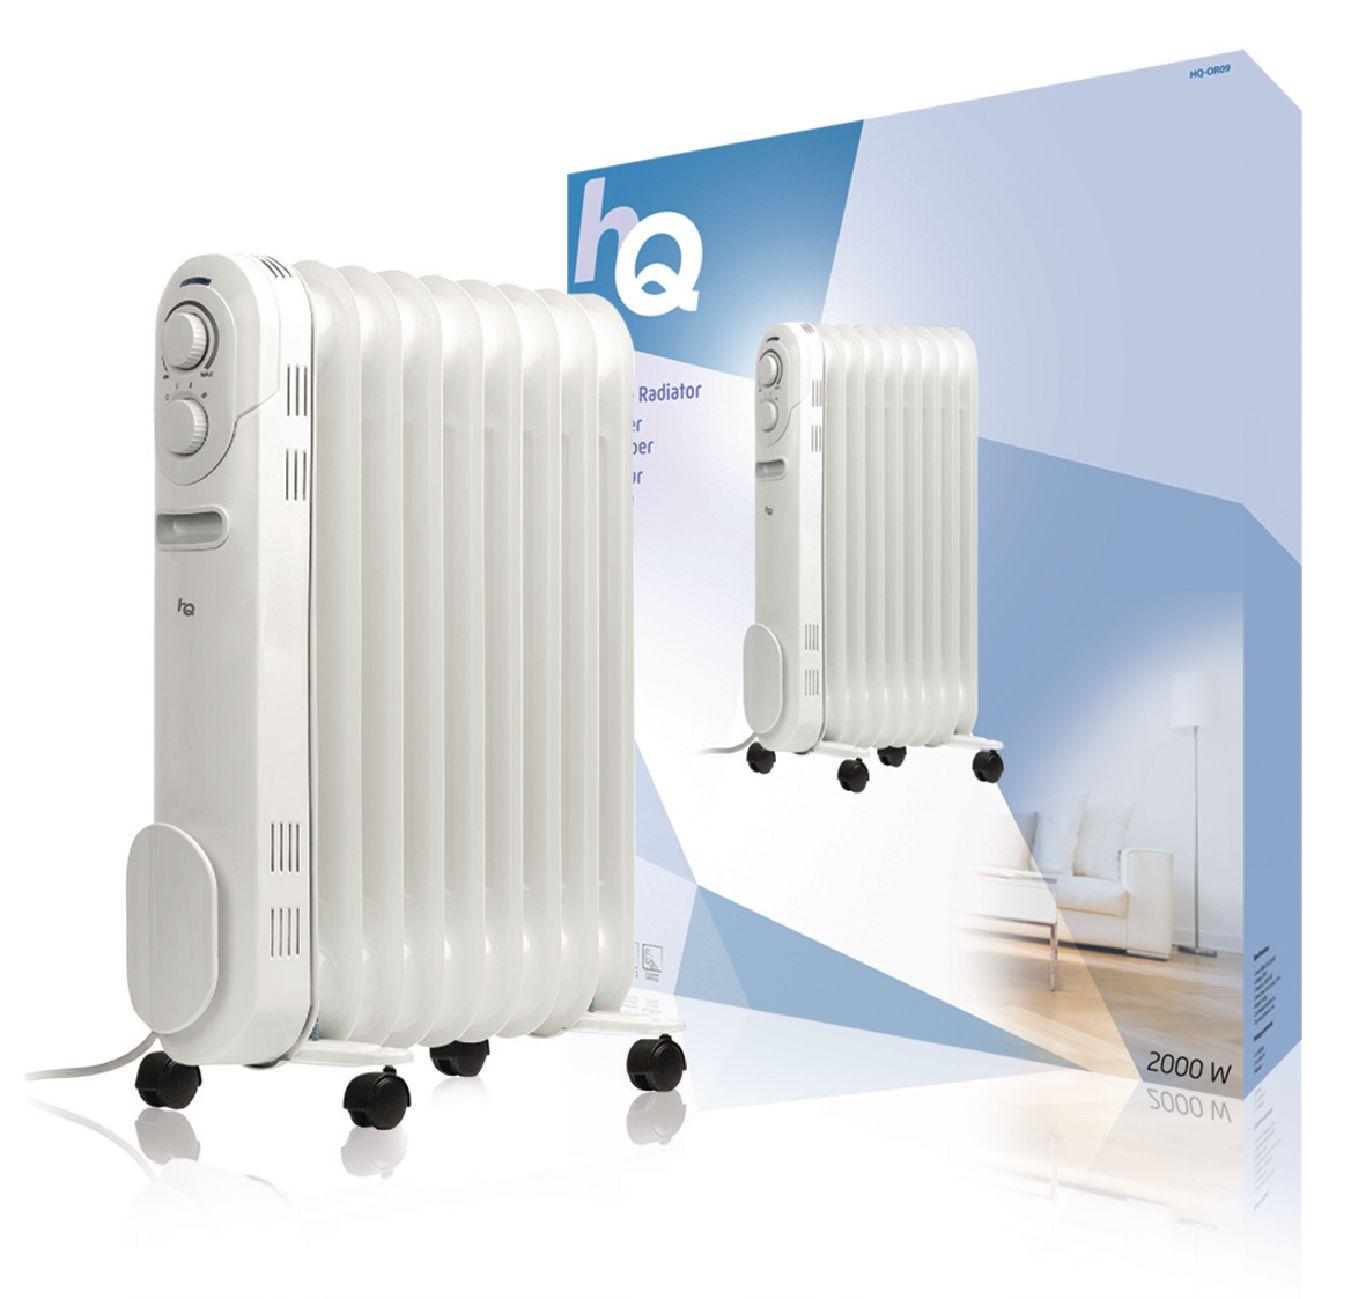 produkt-foto van 'HQ mobiele radiator, vermogen 2000 W, 9 ribben, olie-gevuld'